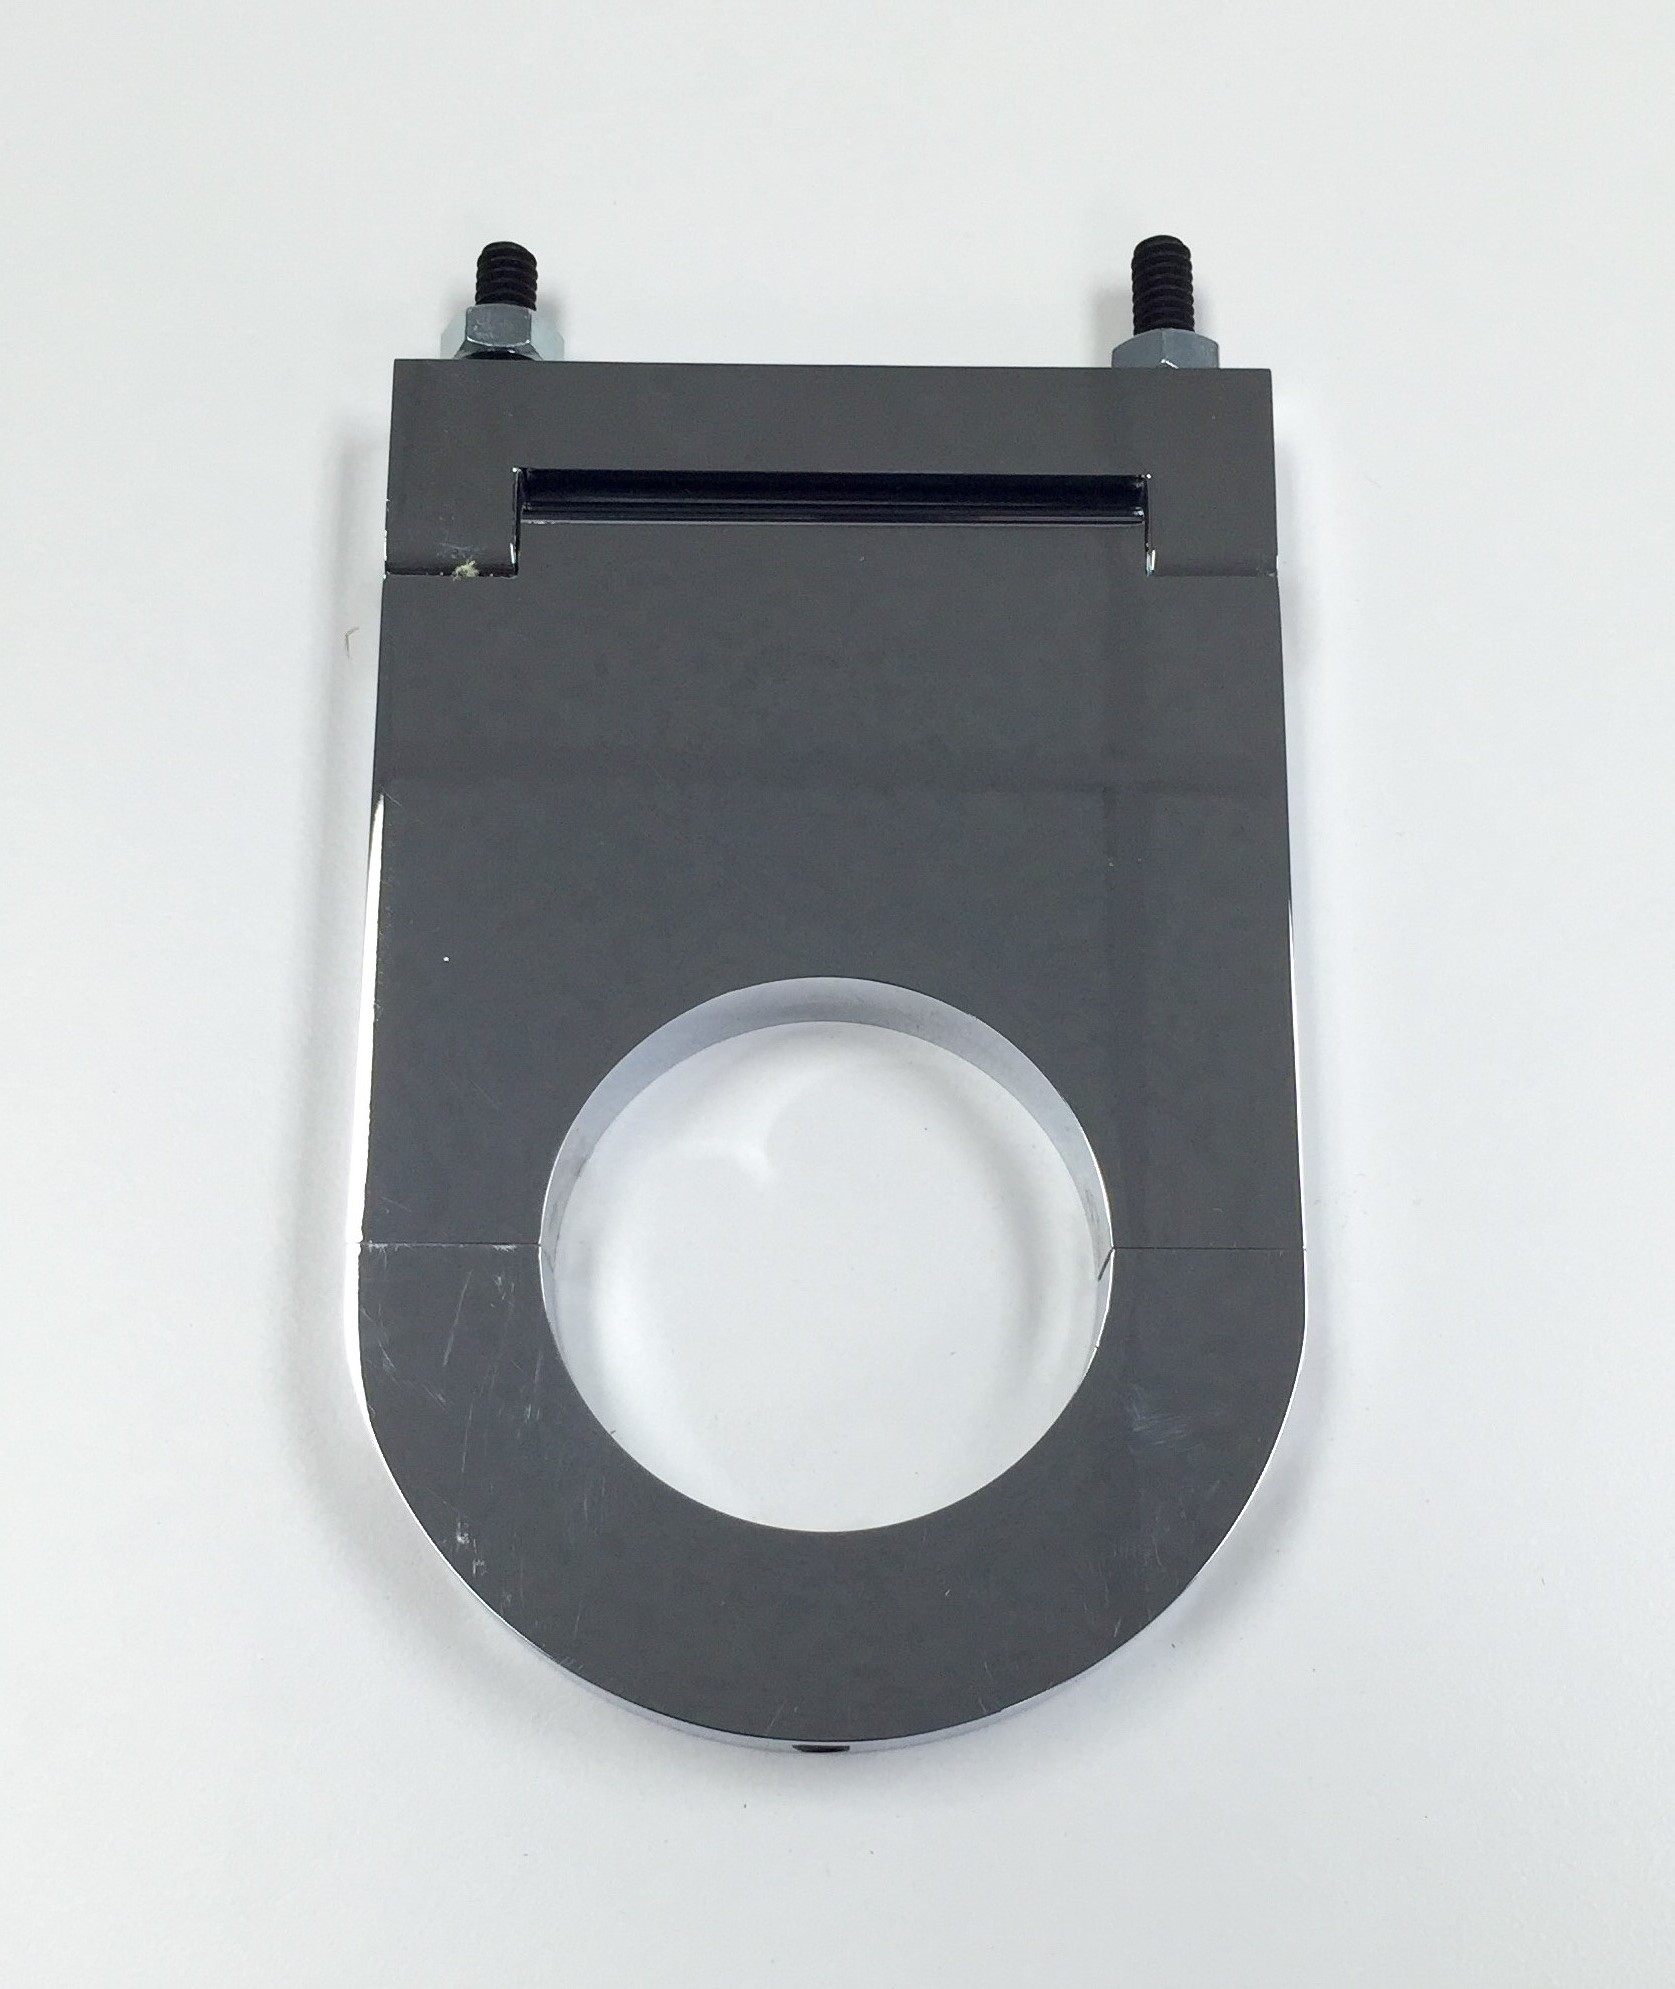 Hot Rod Chrome Aluminum 2 x 3 1/2 Inch Steering Column Drop